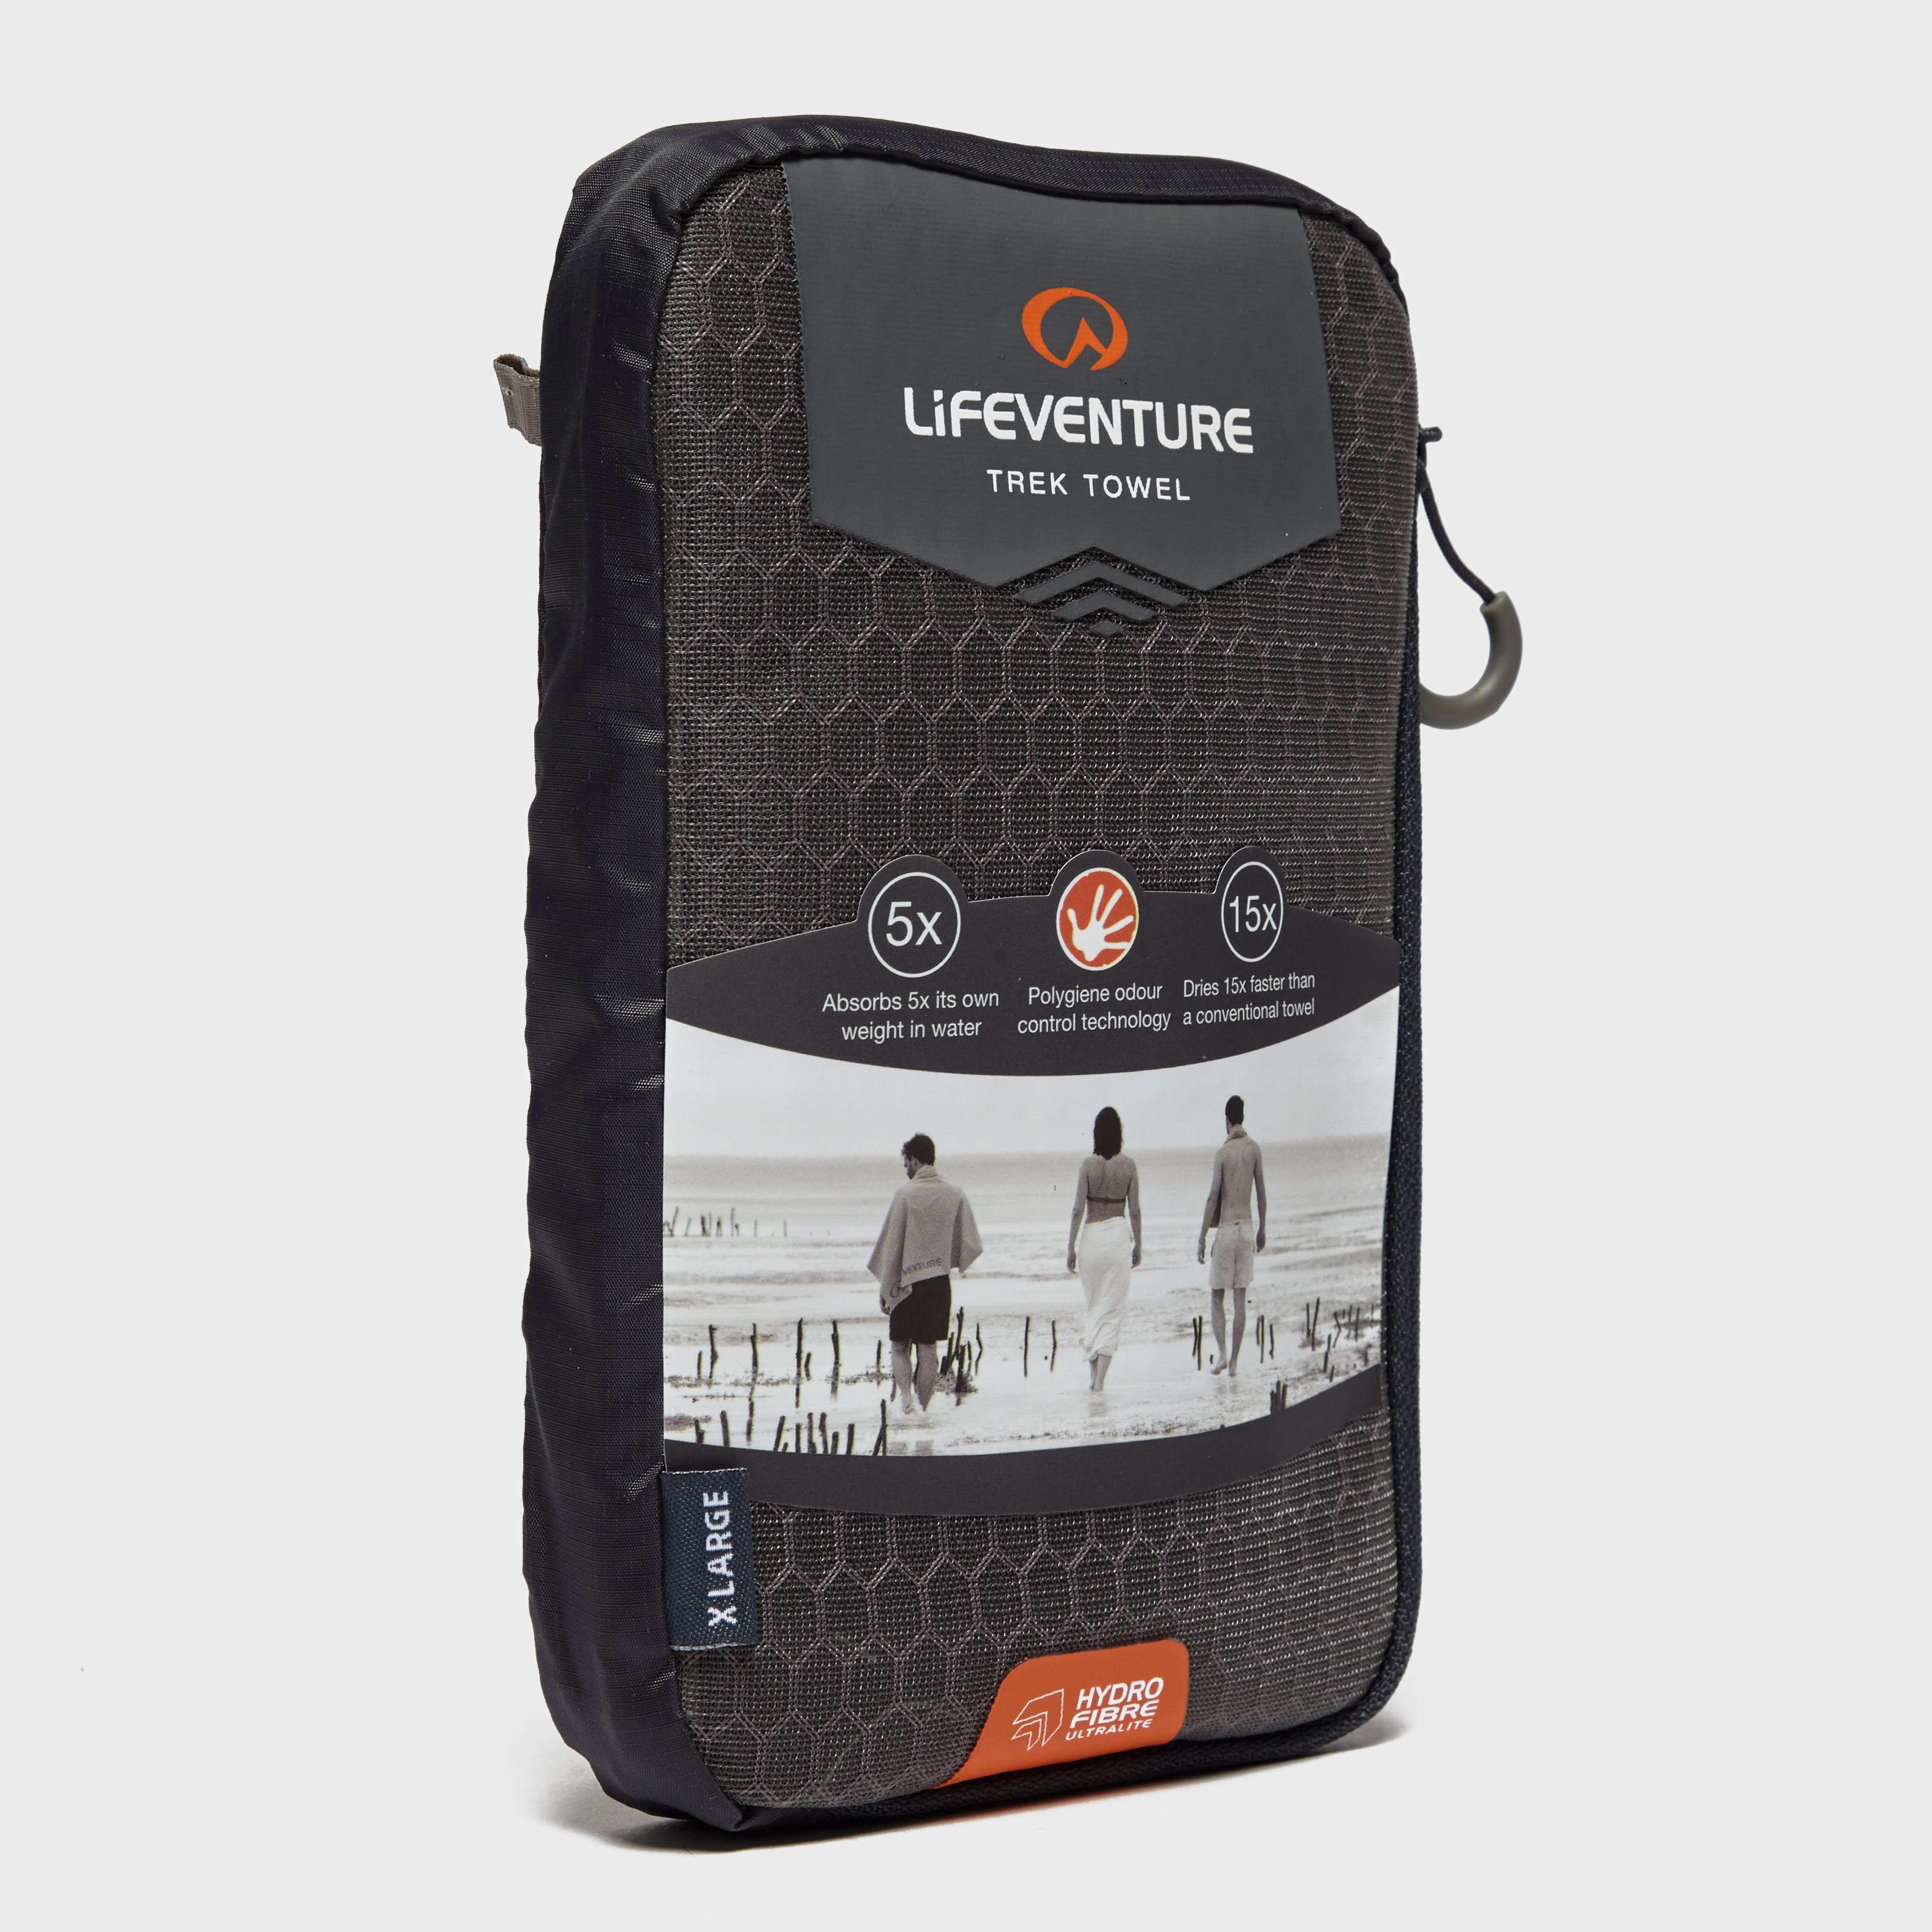 LIFEVENTURE Hydro Fibre UltraLite Travel Towel XL